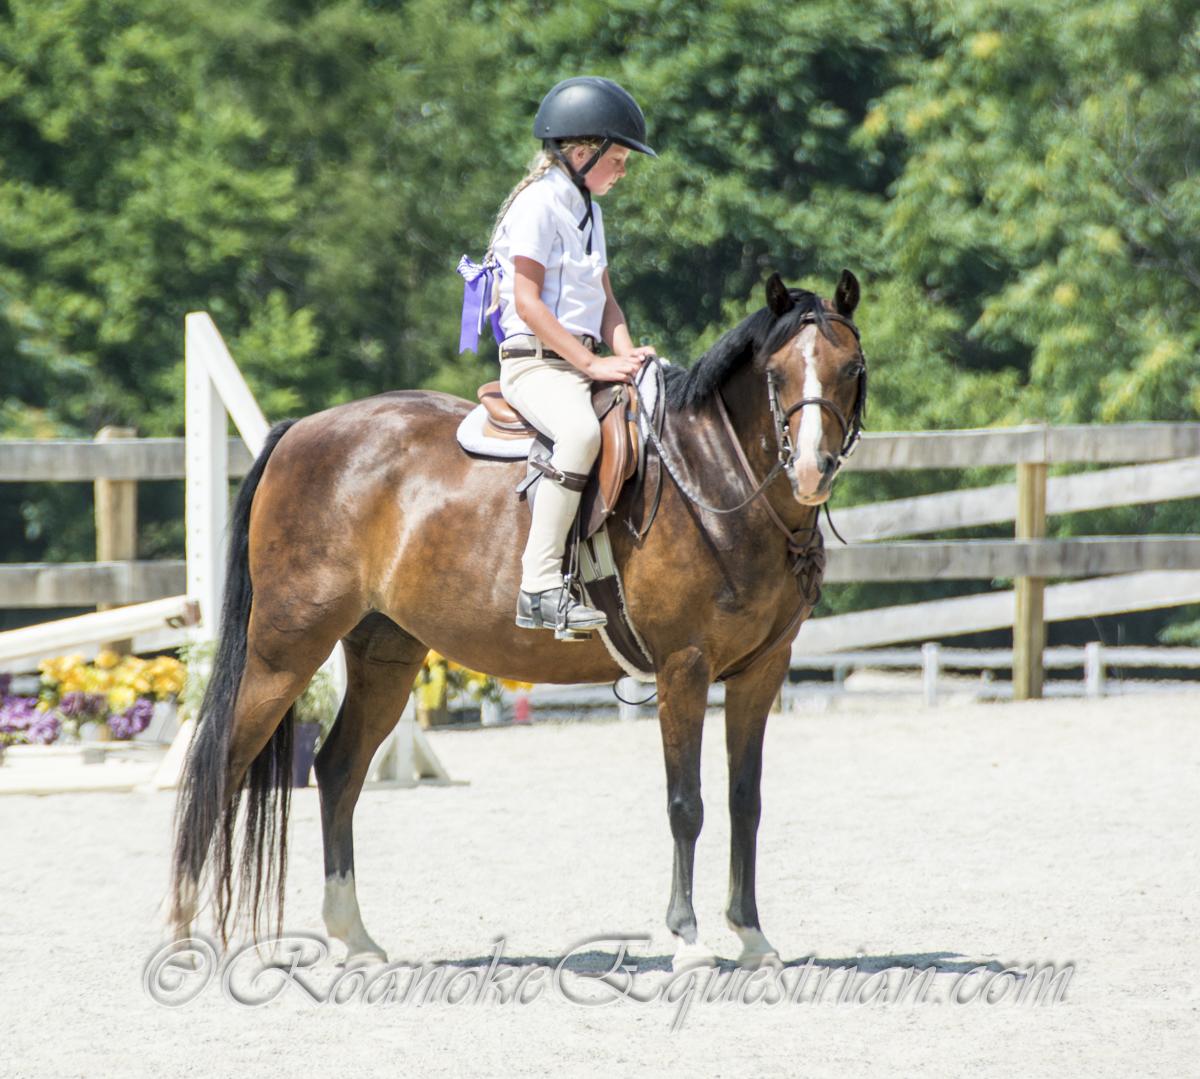 2019 Calendar Roanoke Equestrian